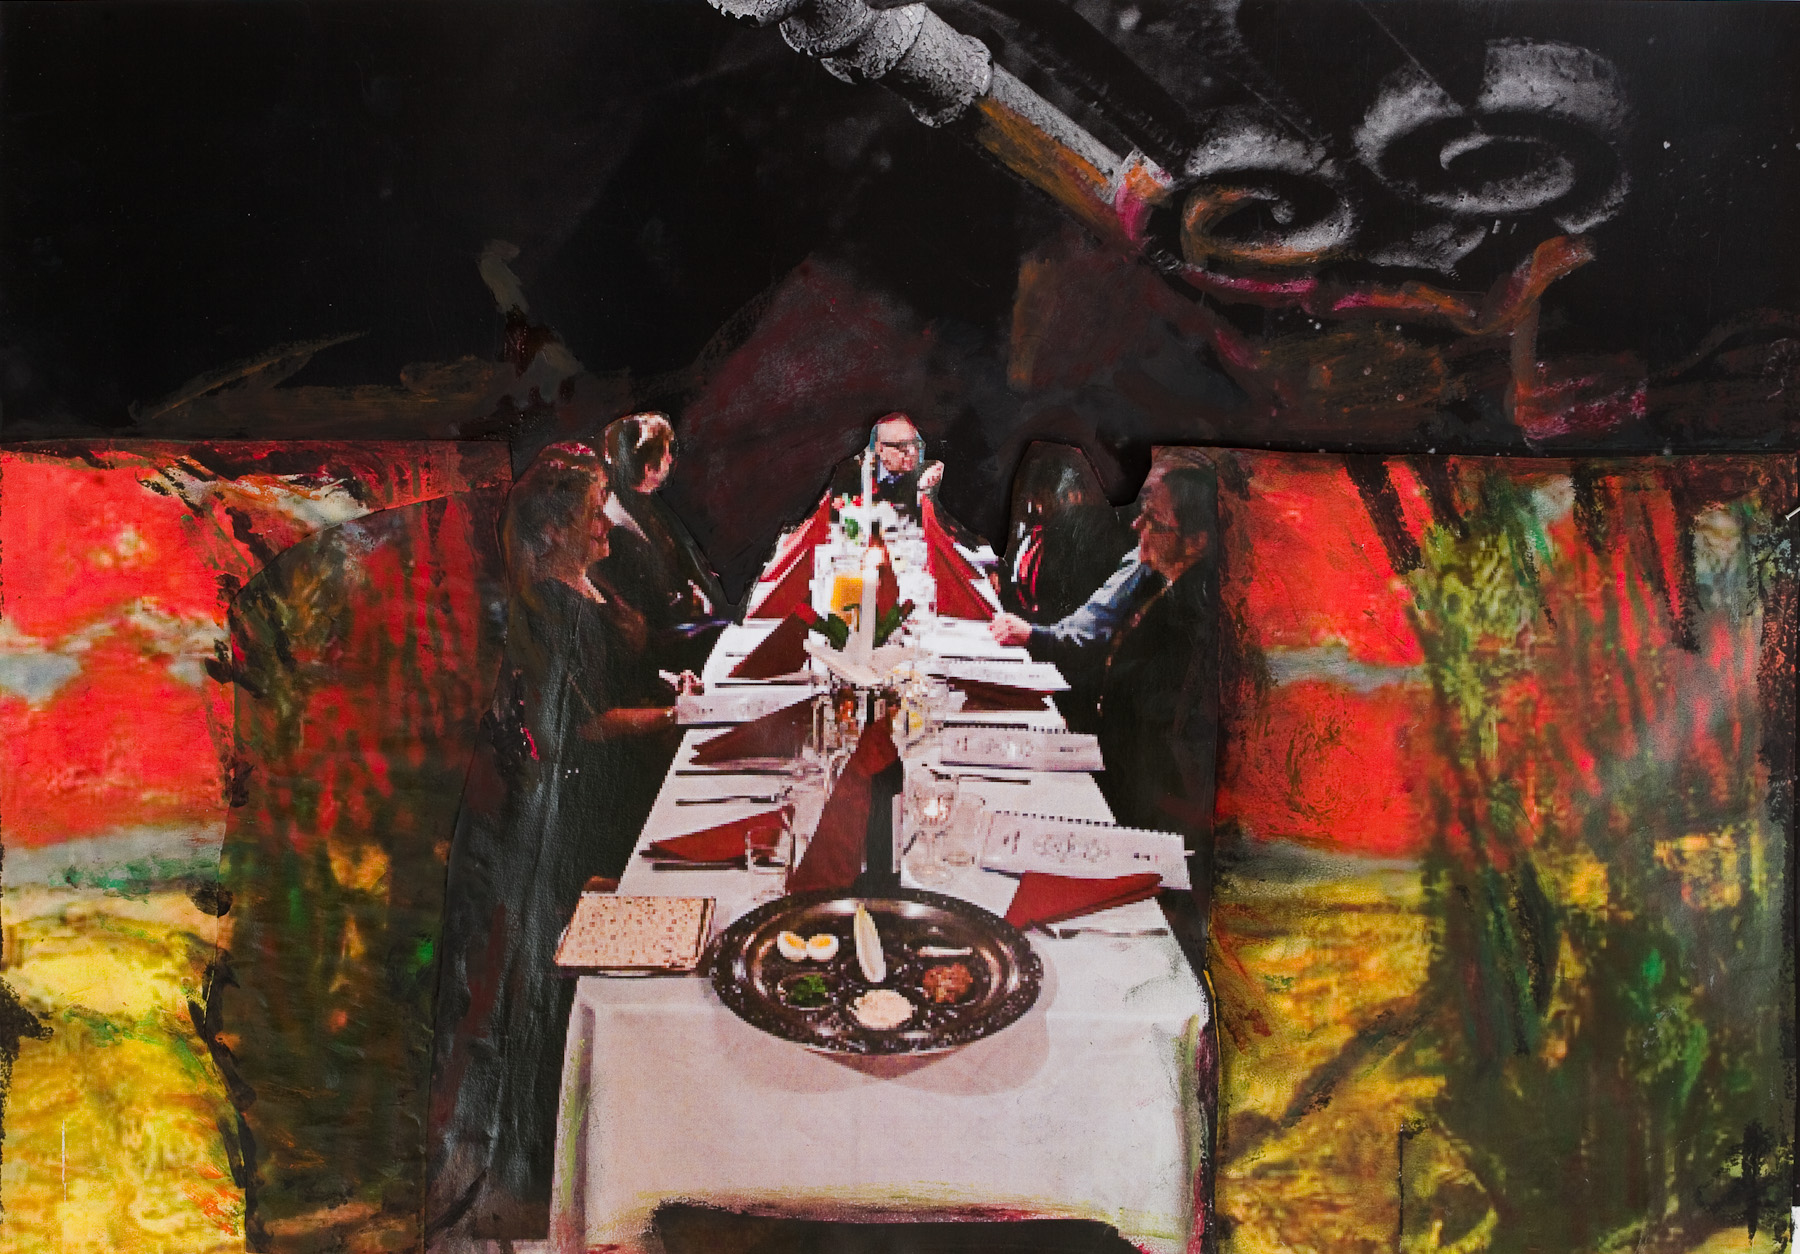 Seder in Warsaw, by Joanna Auron-Gorska